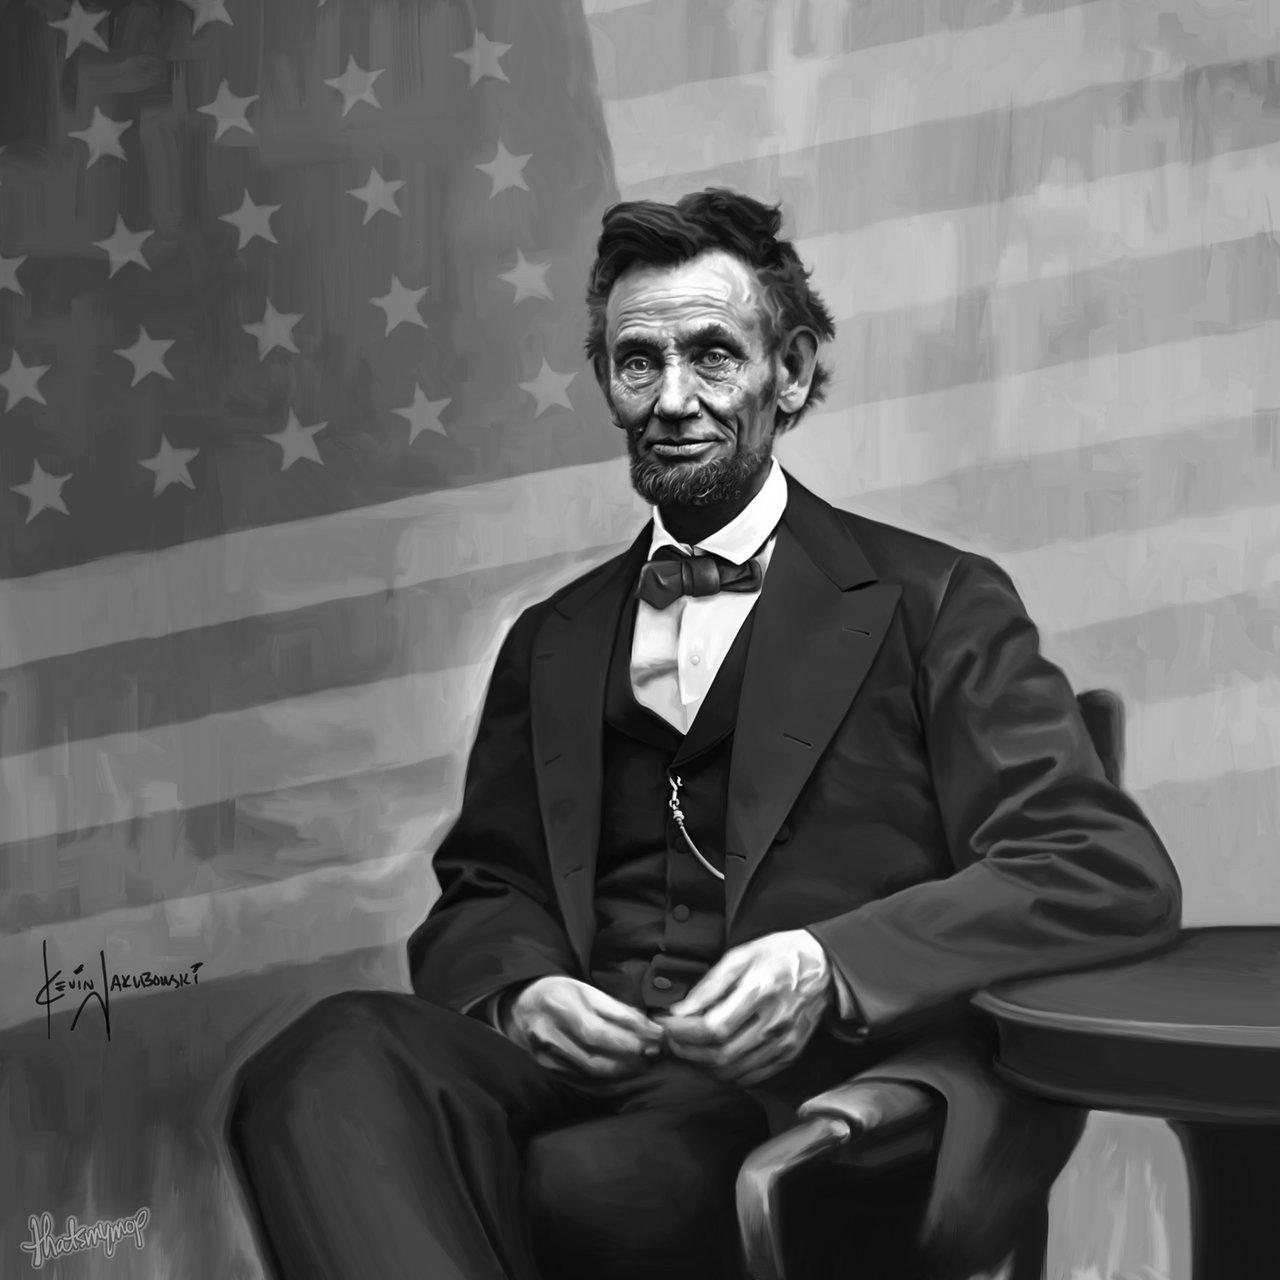 Abraham Lincoln Wallpaper 1280x1280